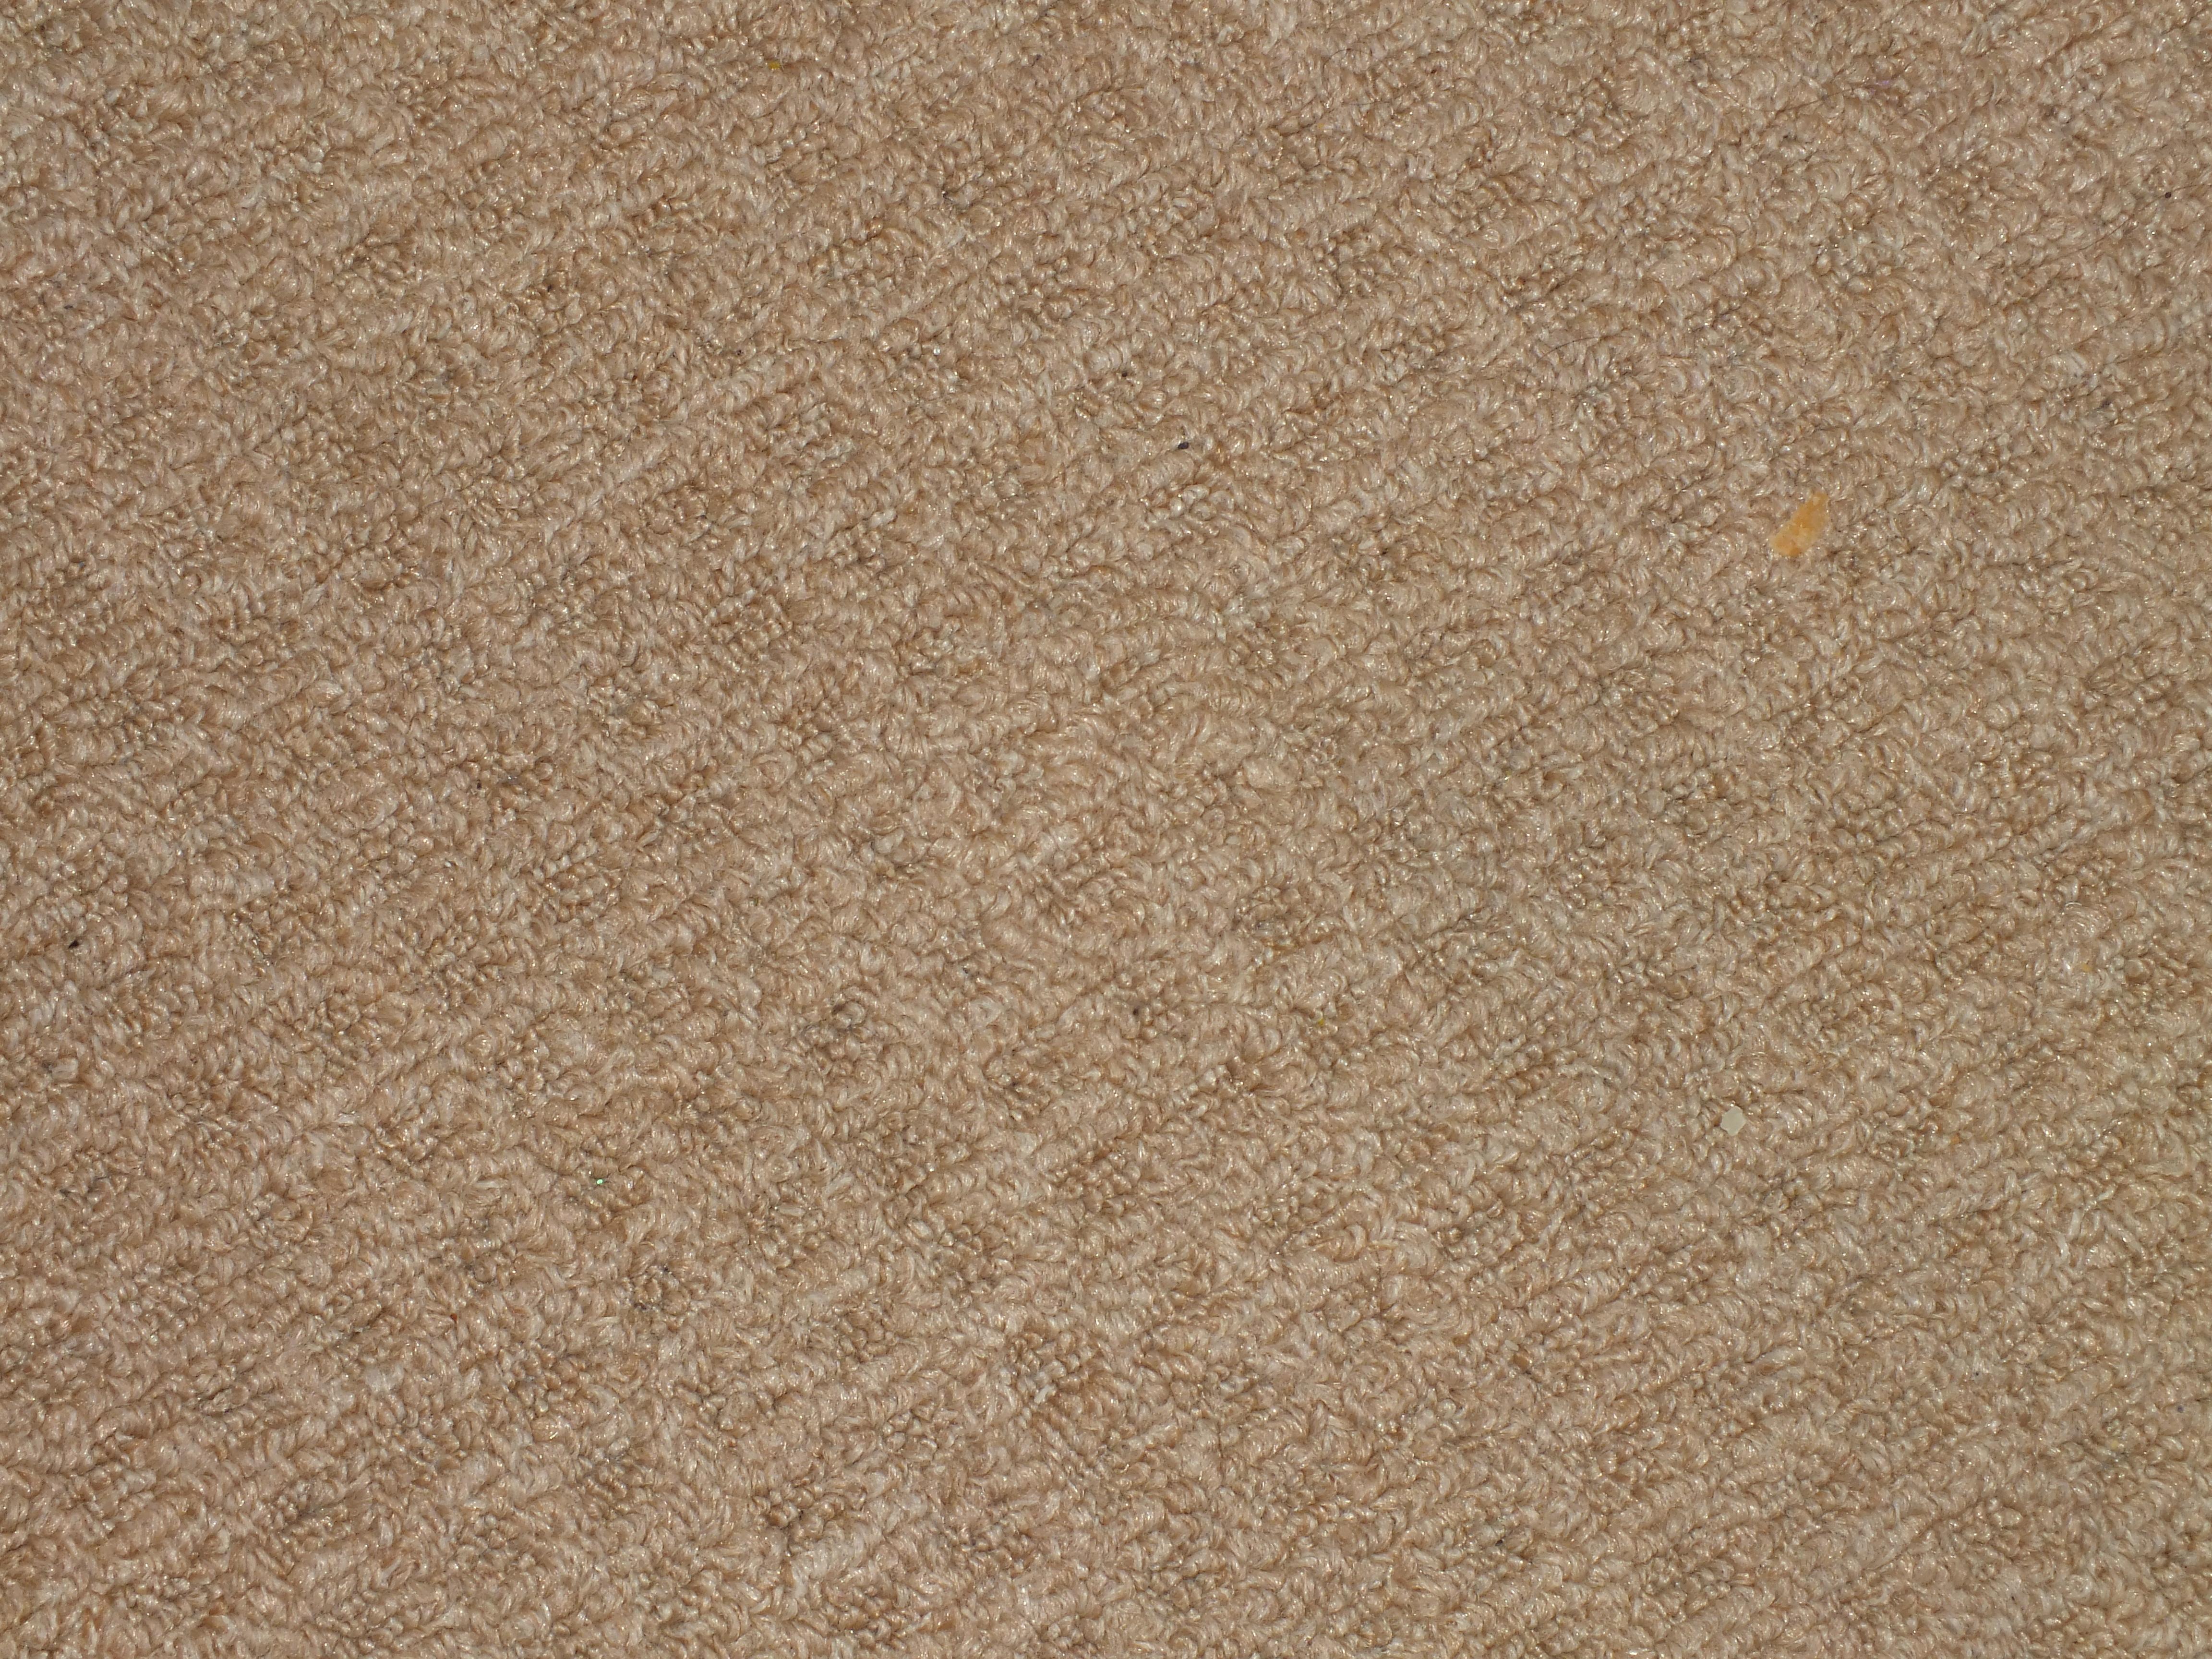 Carpet texture photo